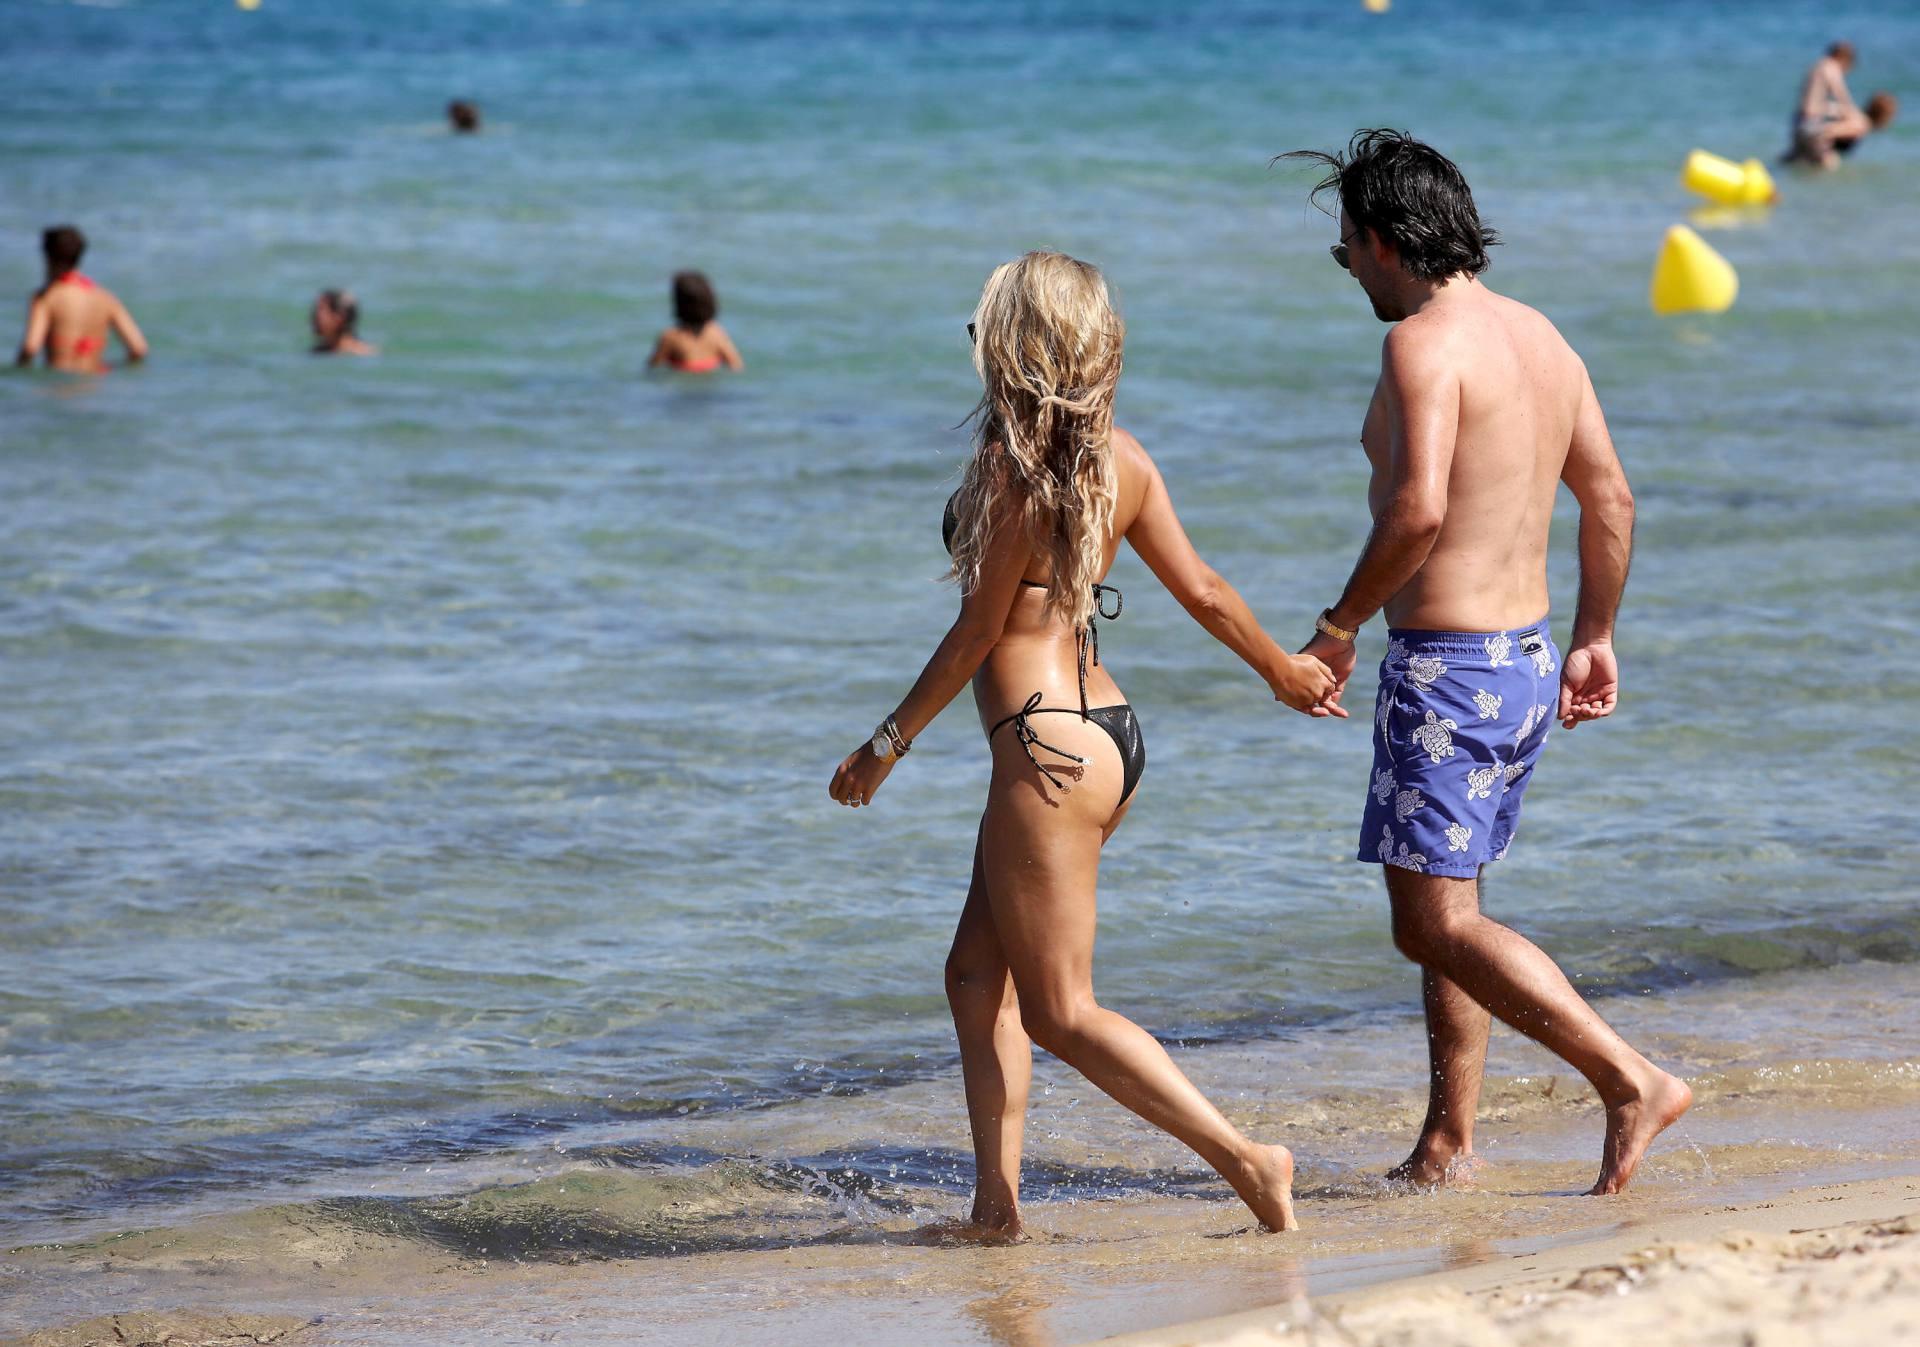 Sylvie Meis – Sexy Boobs In Bikini On The Beach In Saint Tropez 0022